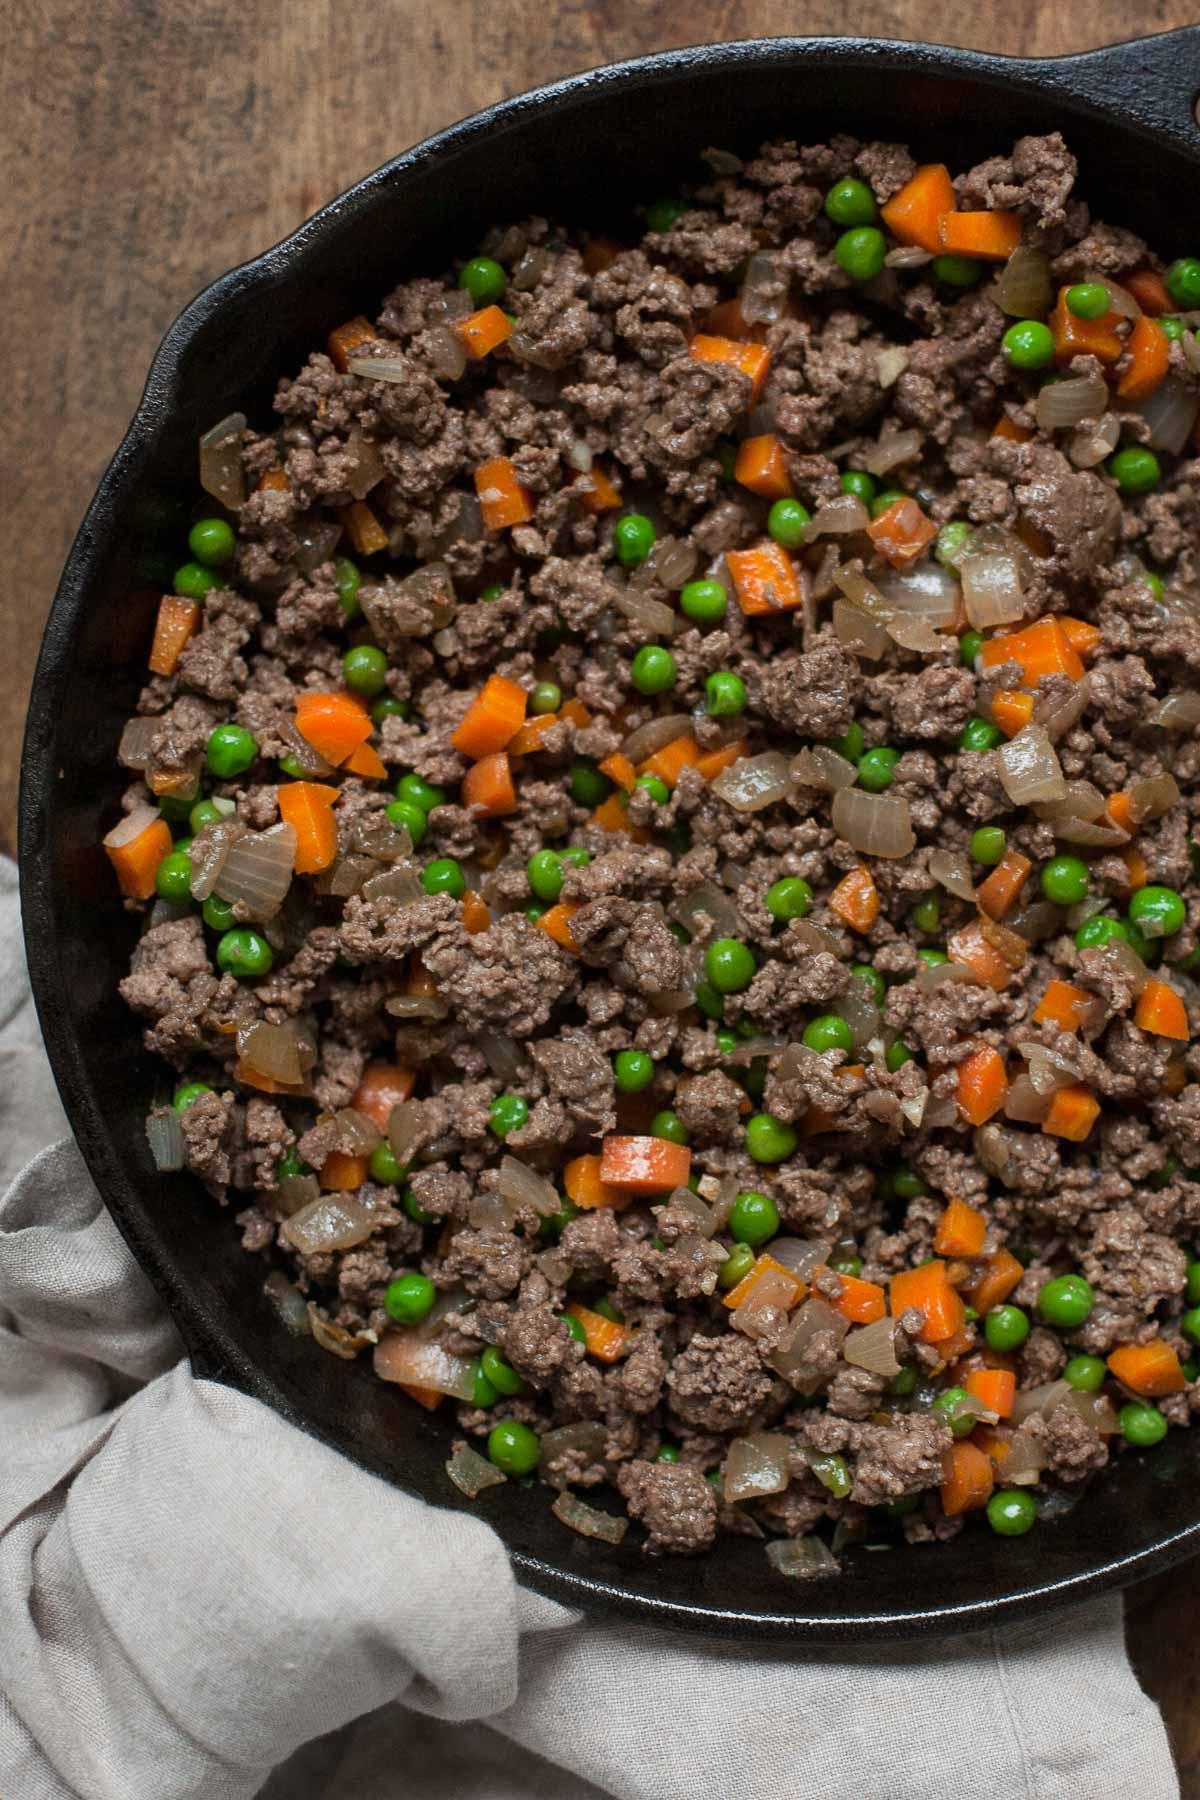 Shepherd's Pie with Rutabaga (Gluten free, Paleo, Whole30)